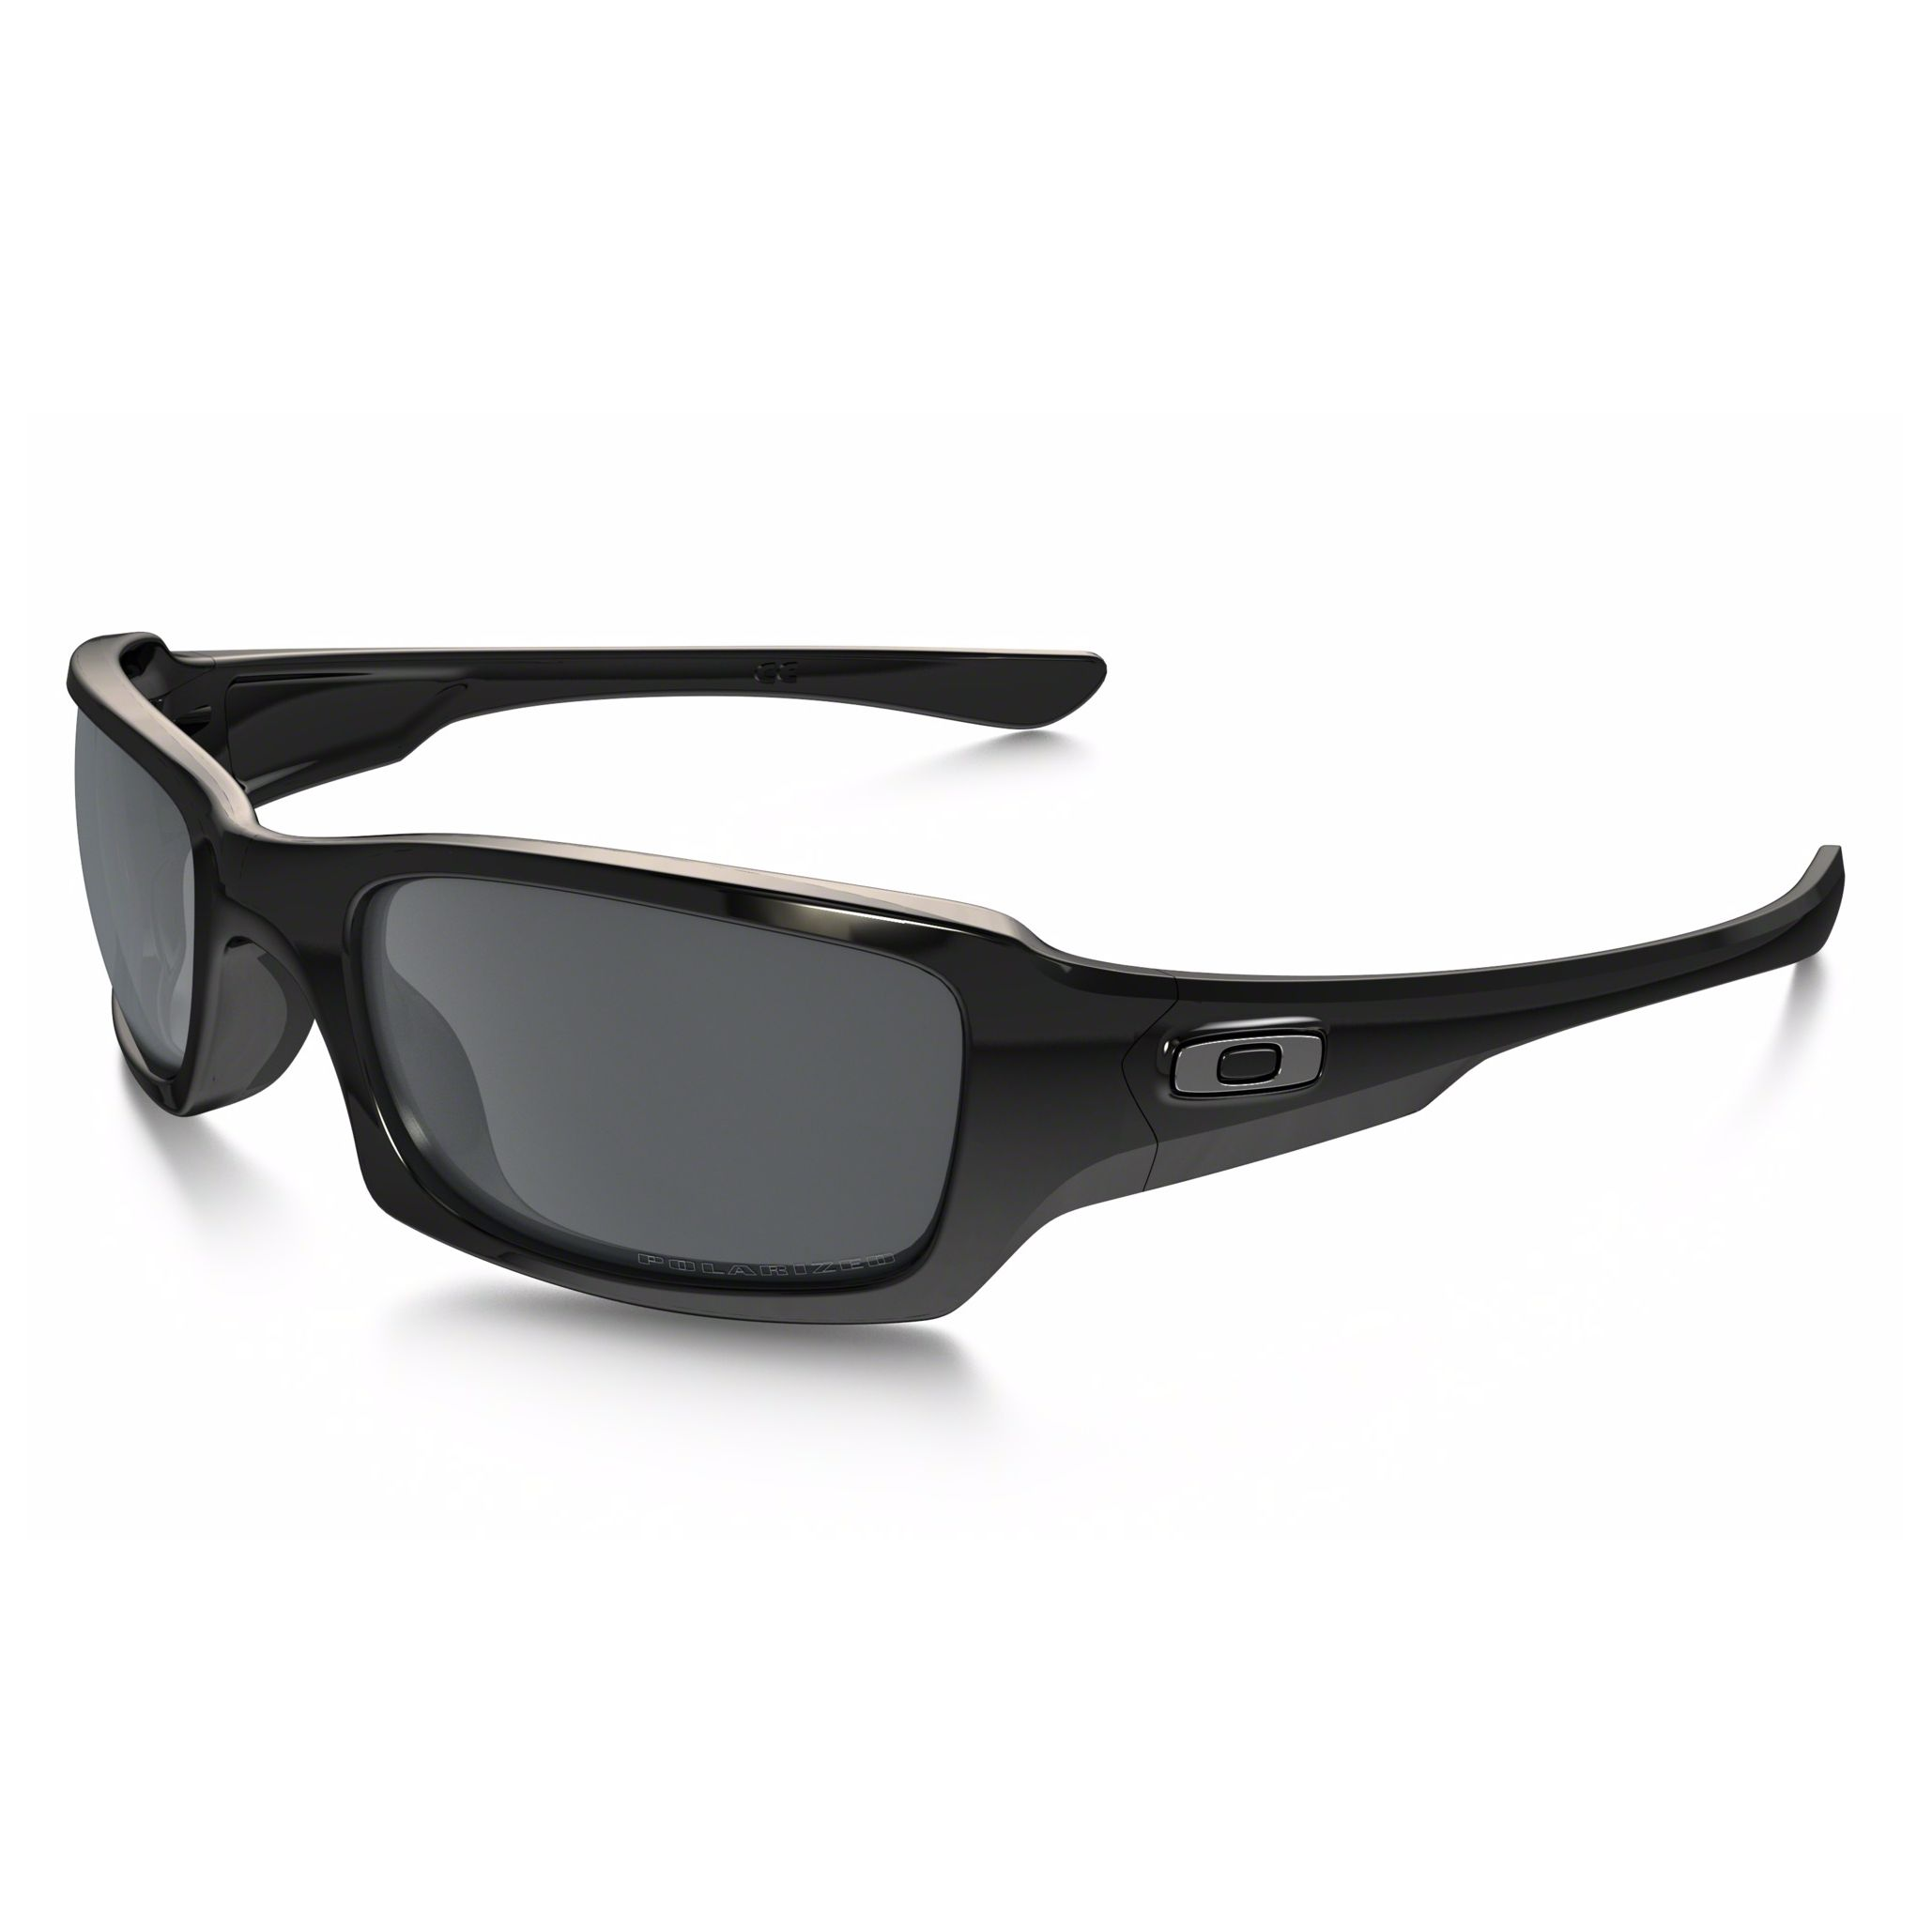 9848b69346 Gafas de sol Oakley FIVES SQUARED - POLISHED BLACK - BLACK IRIDIUM POLARIZED